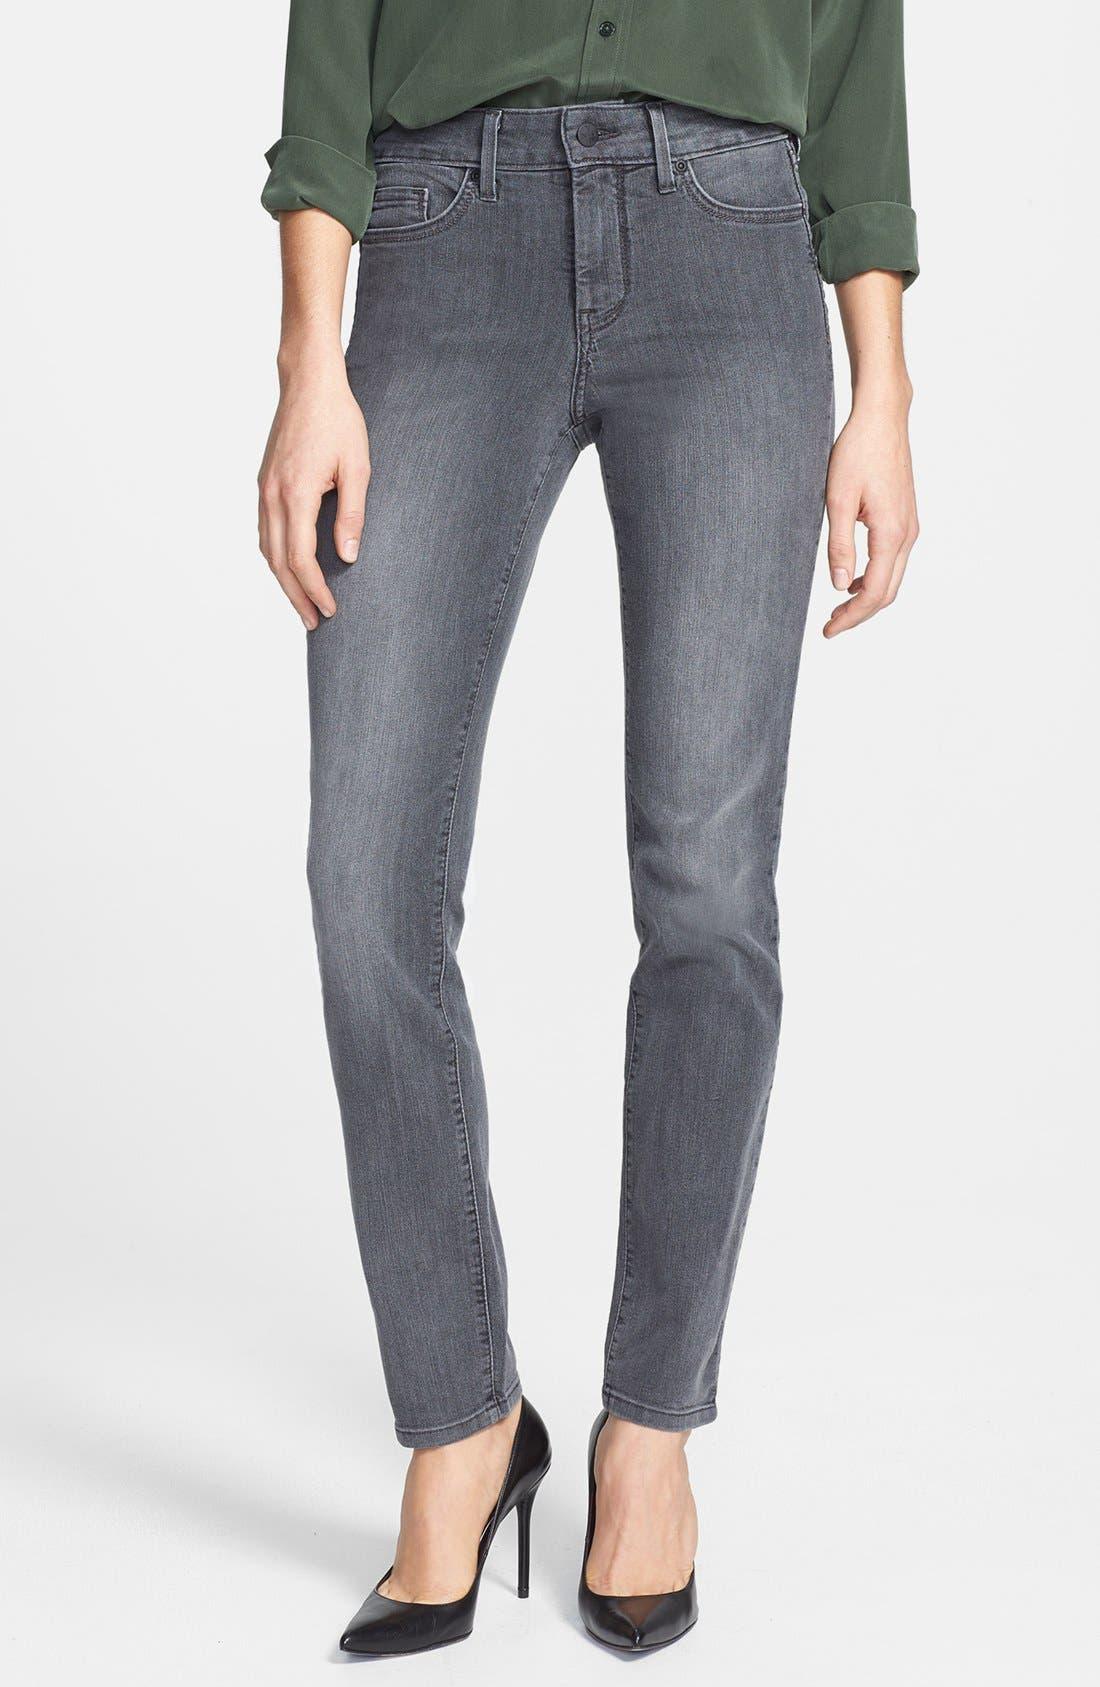 Alternate Image 1 Selected - NYDJ 'Alina' Stretch Skinny Jeans (Basalt) (Petite)